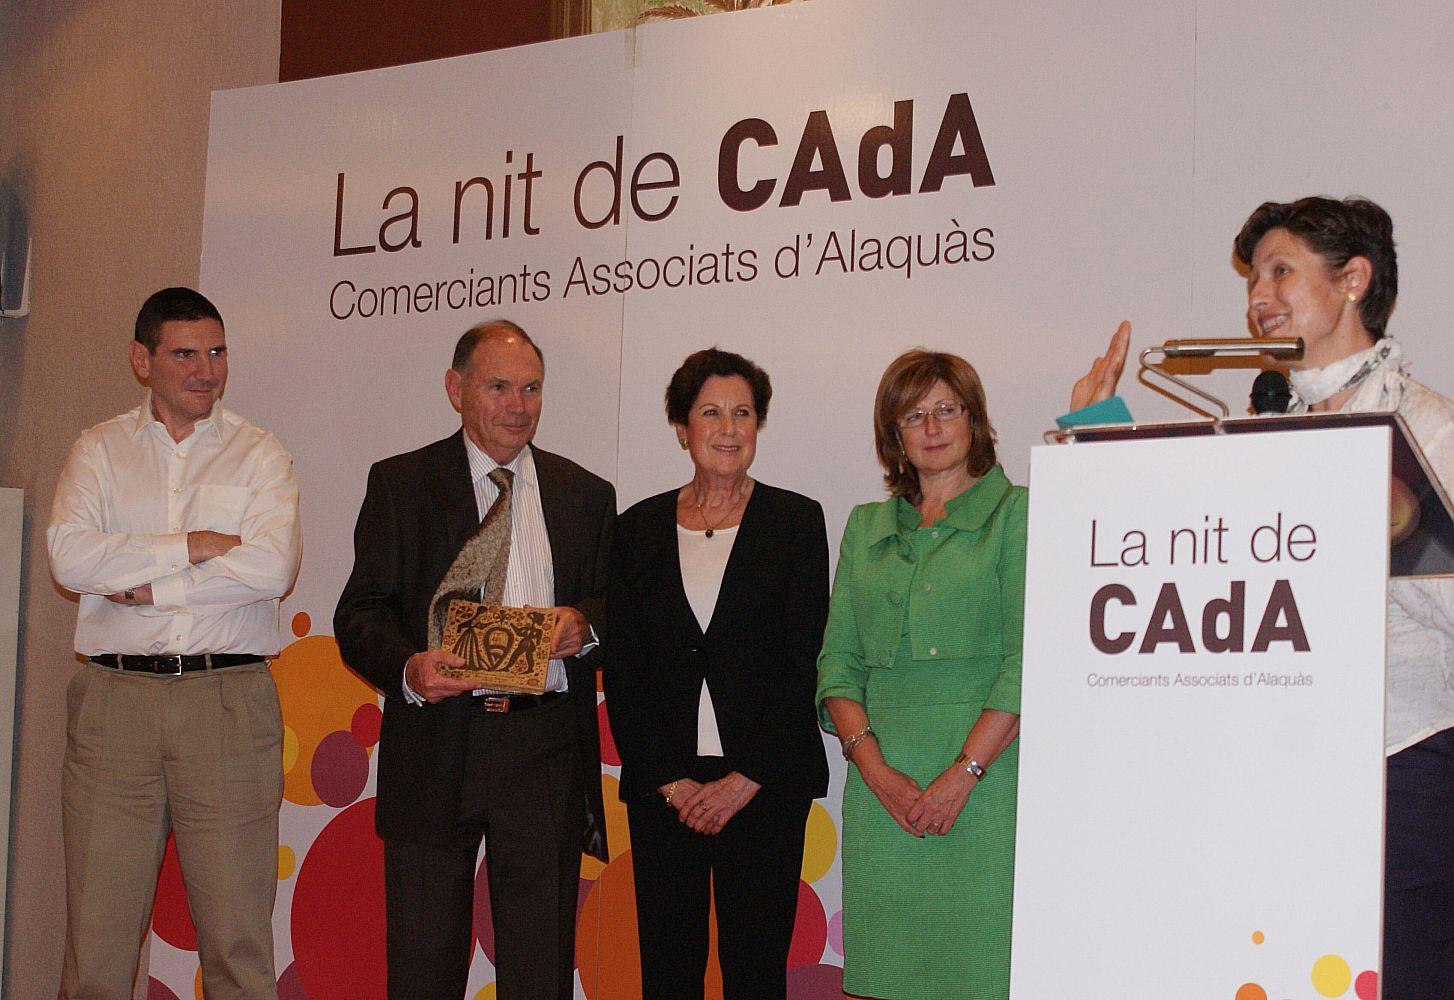 Ajuntament d 39 alaqu s prensa cada celebra su noche de gala - Trabajo en alaquas ...